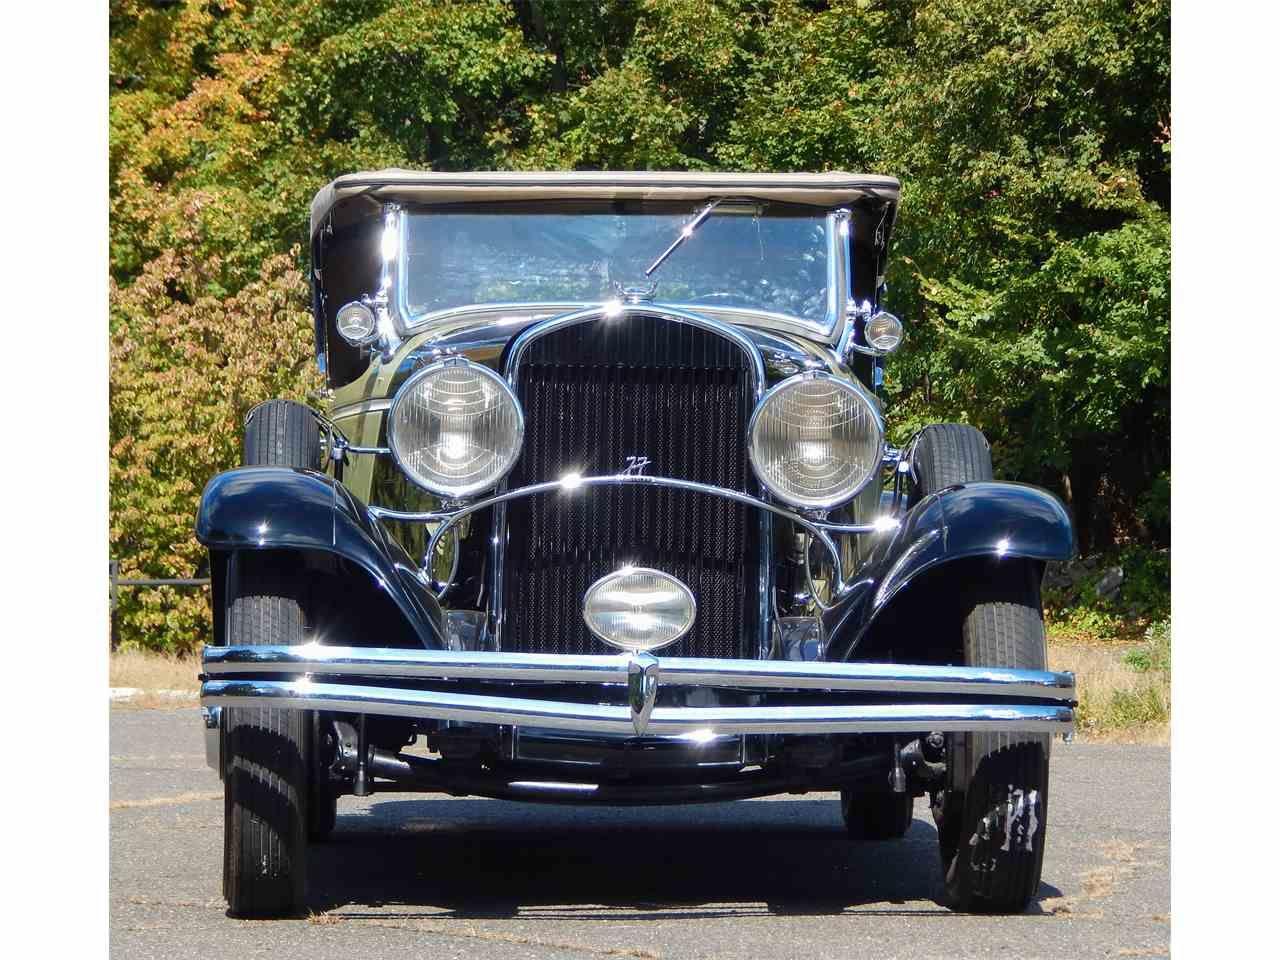 New Car. Old Car: 1930 Chrysler Model 77 | https://newcaroldcar ...